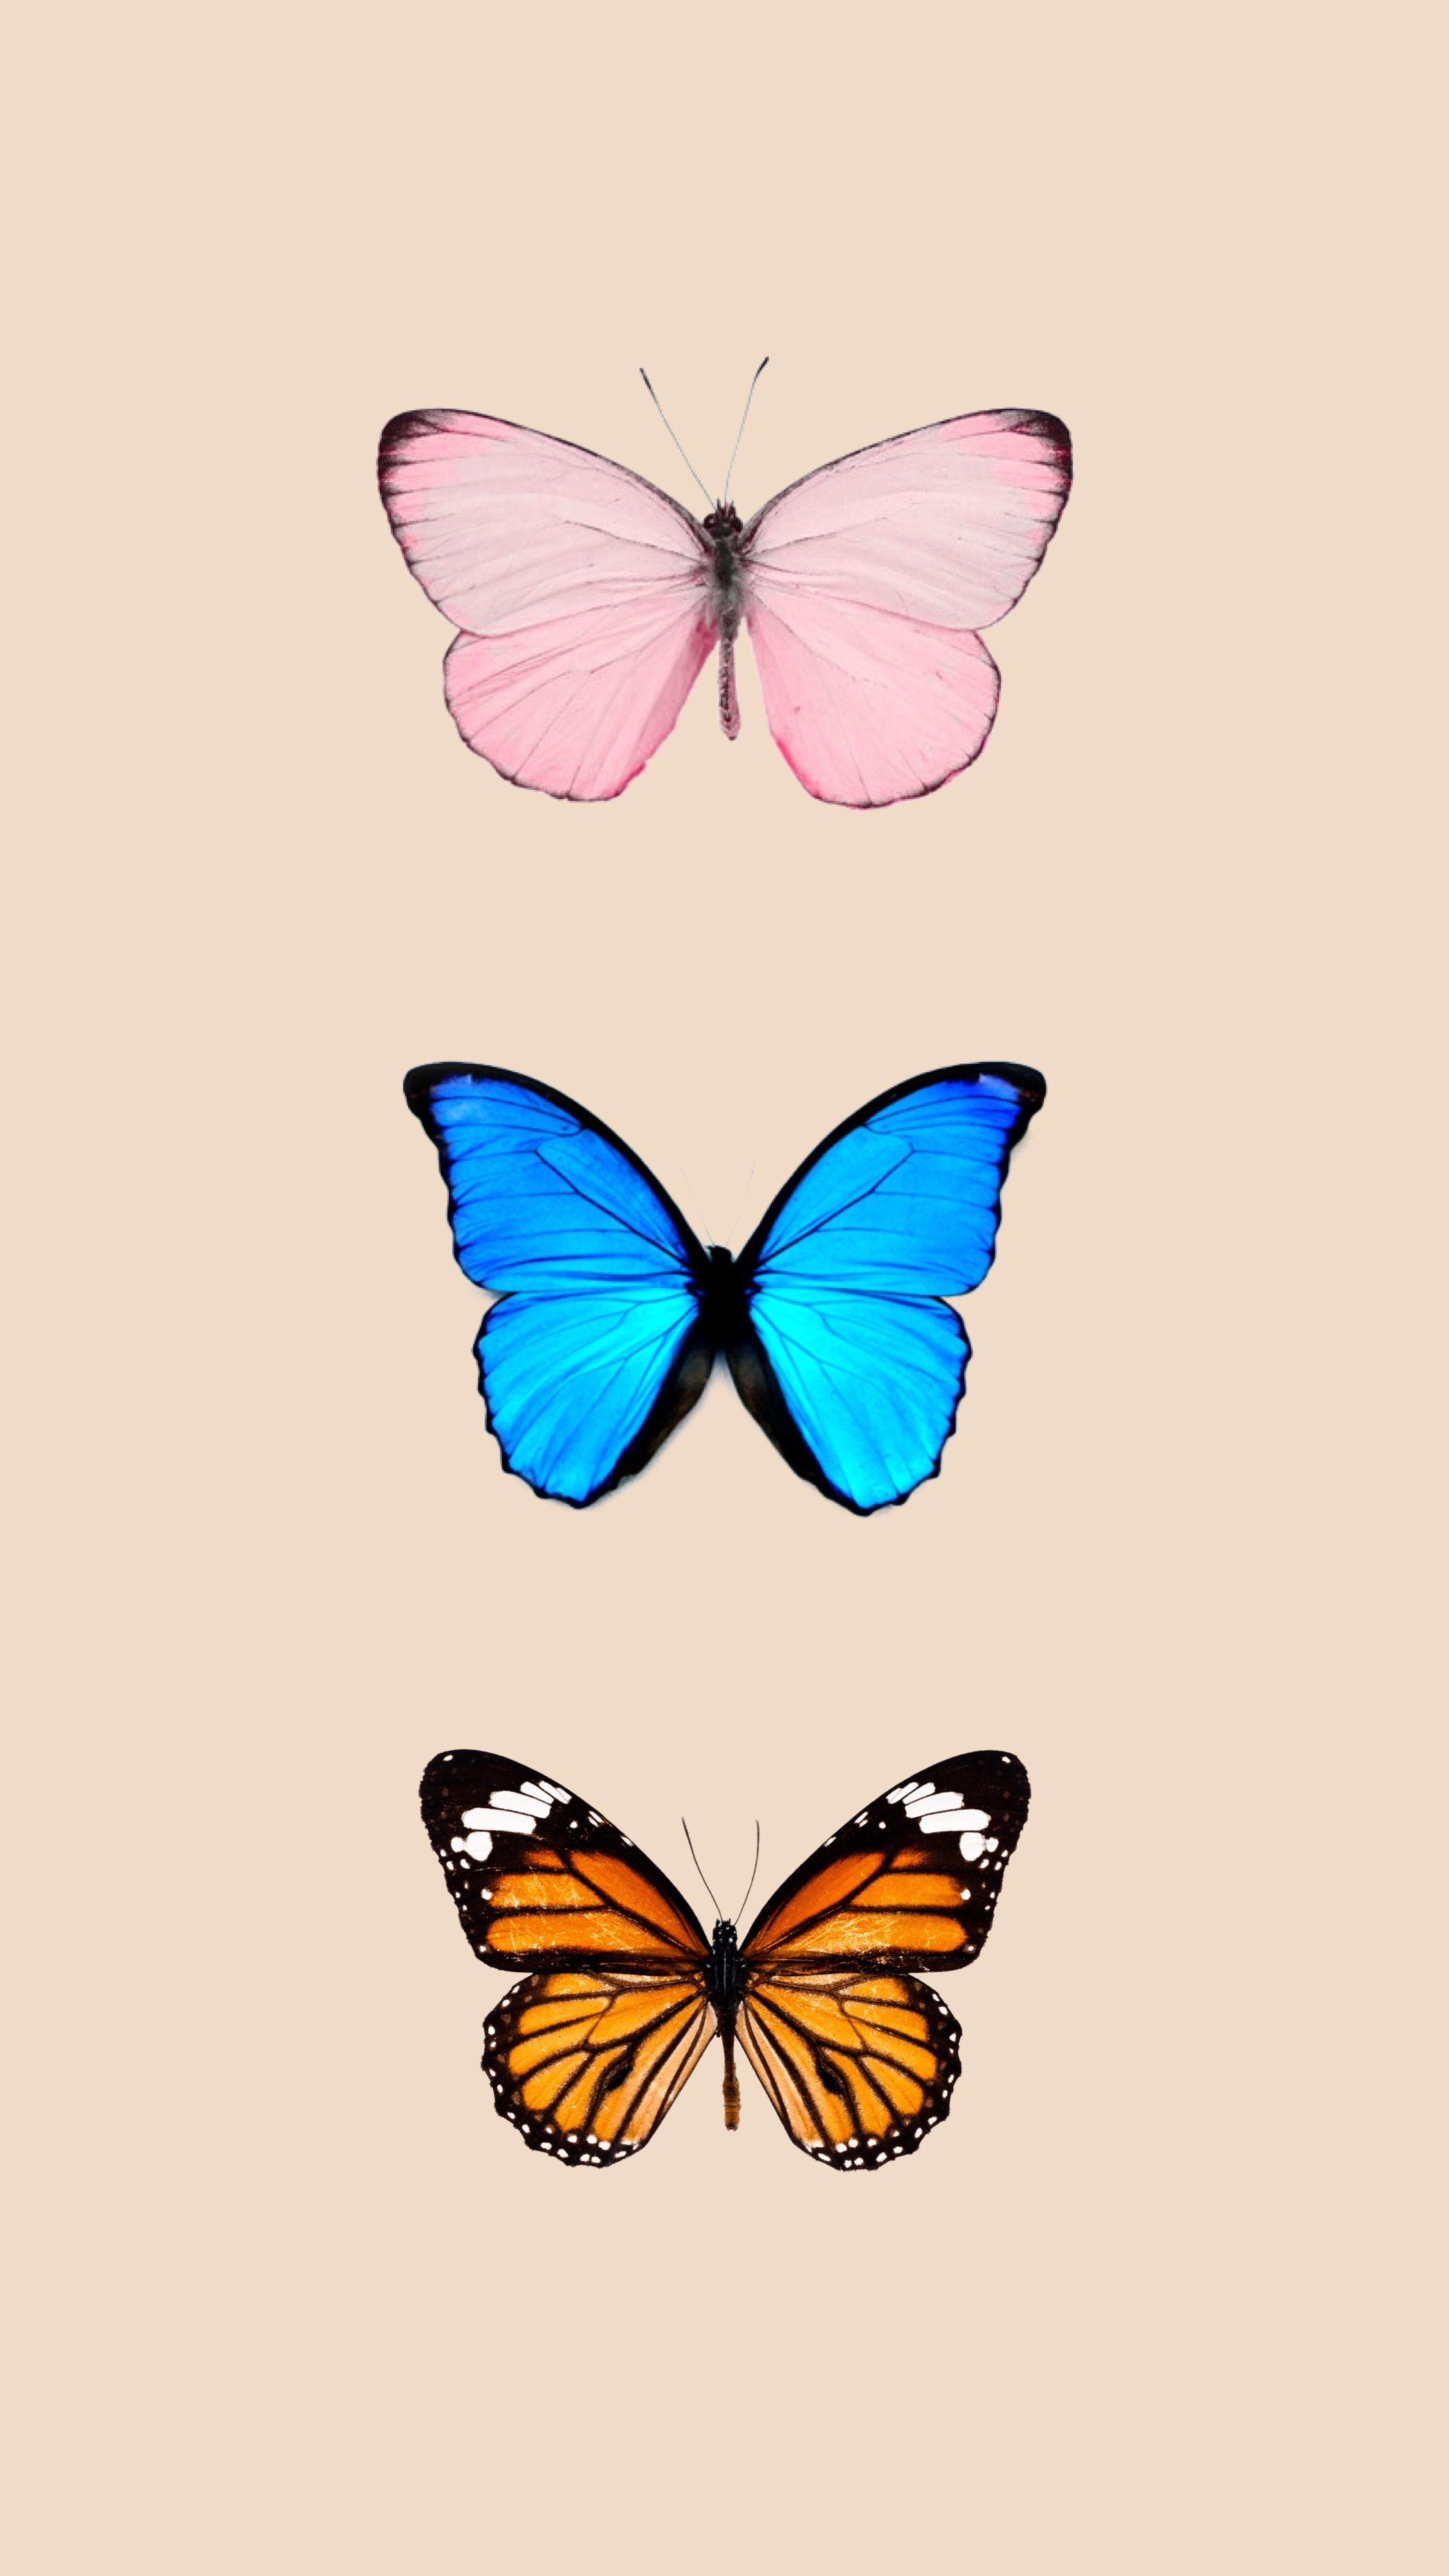 Butterfly wallpaper | Butterfly wallpaper backgrounds ...